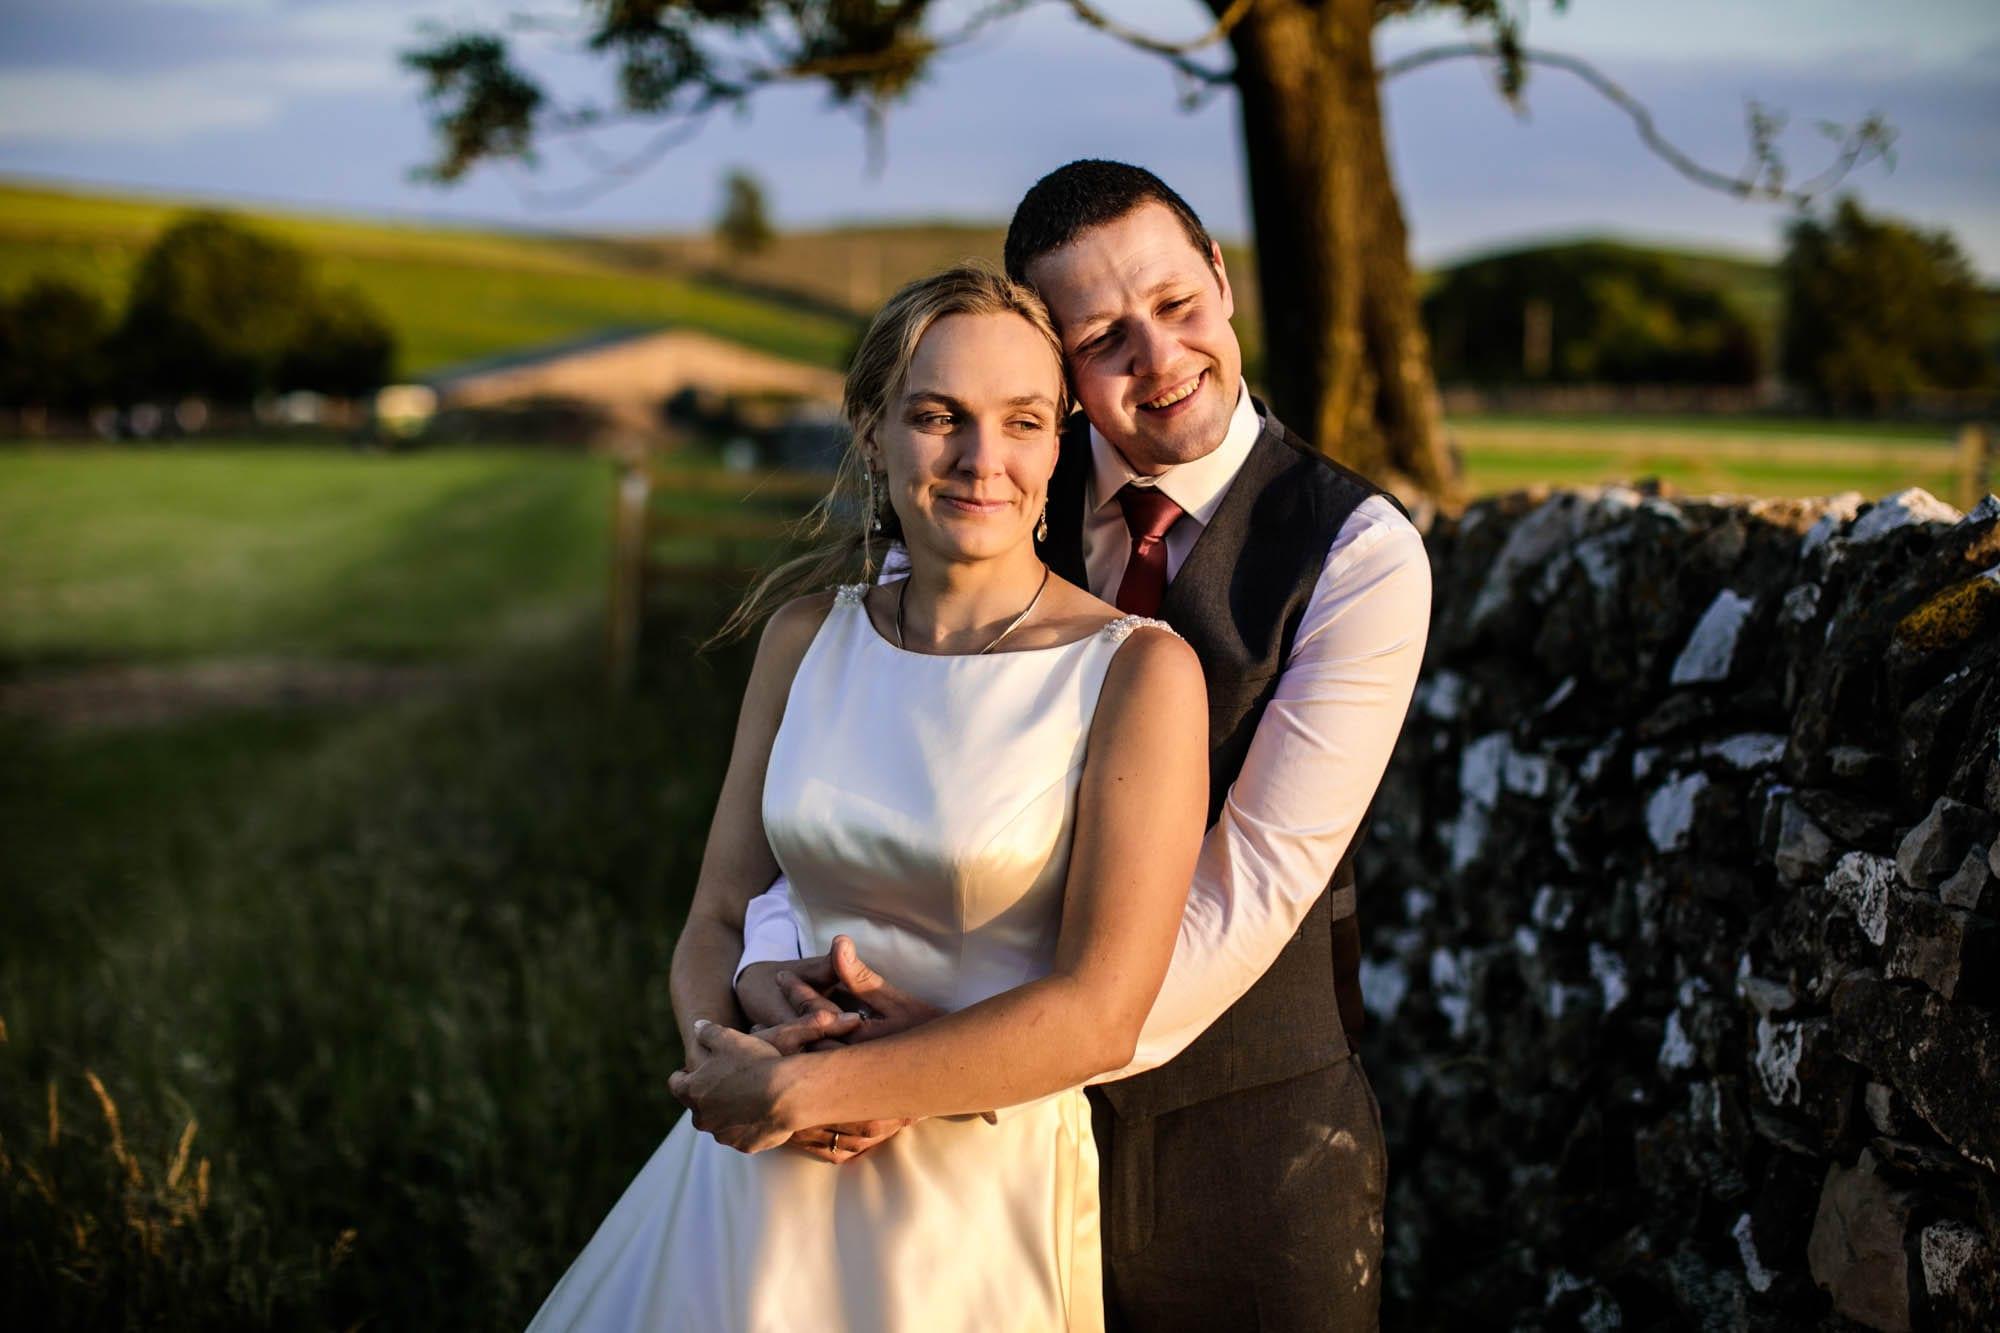 Colourful Wedding Photographer Lower Damgate Farm